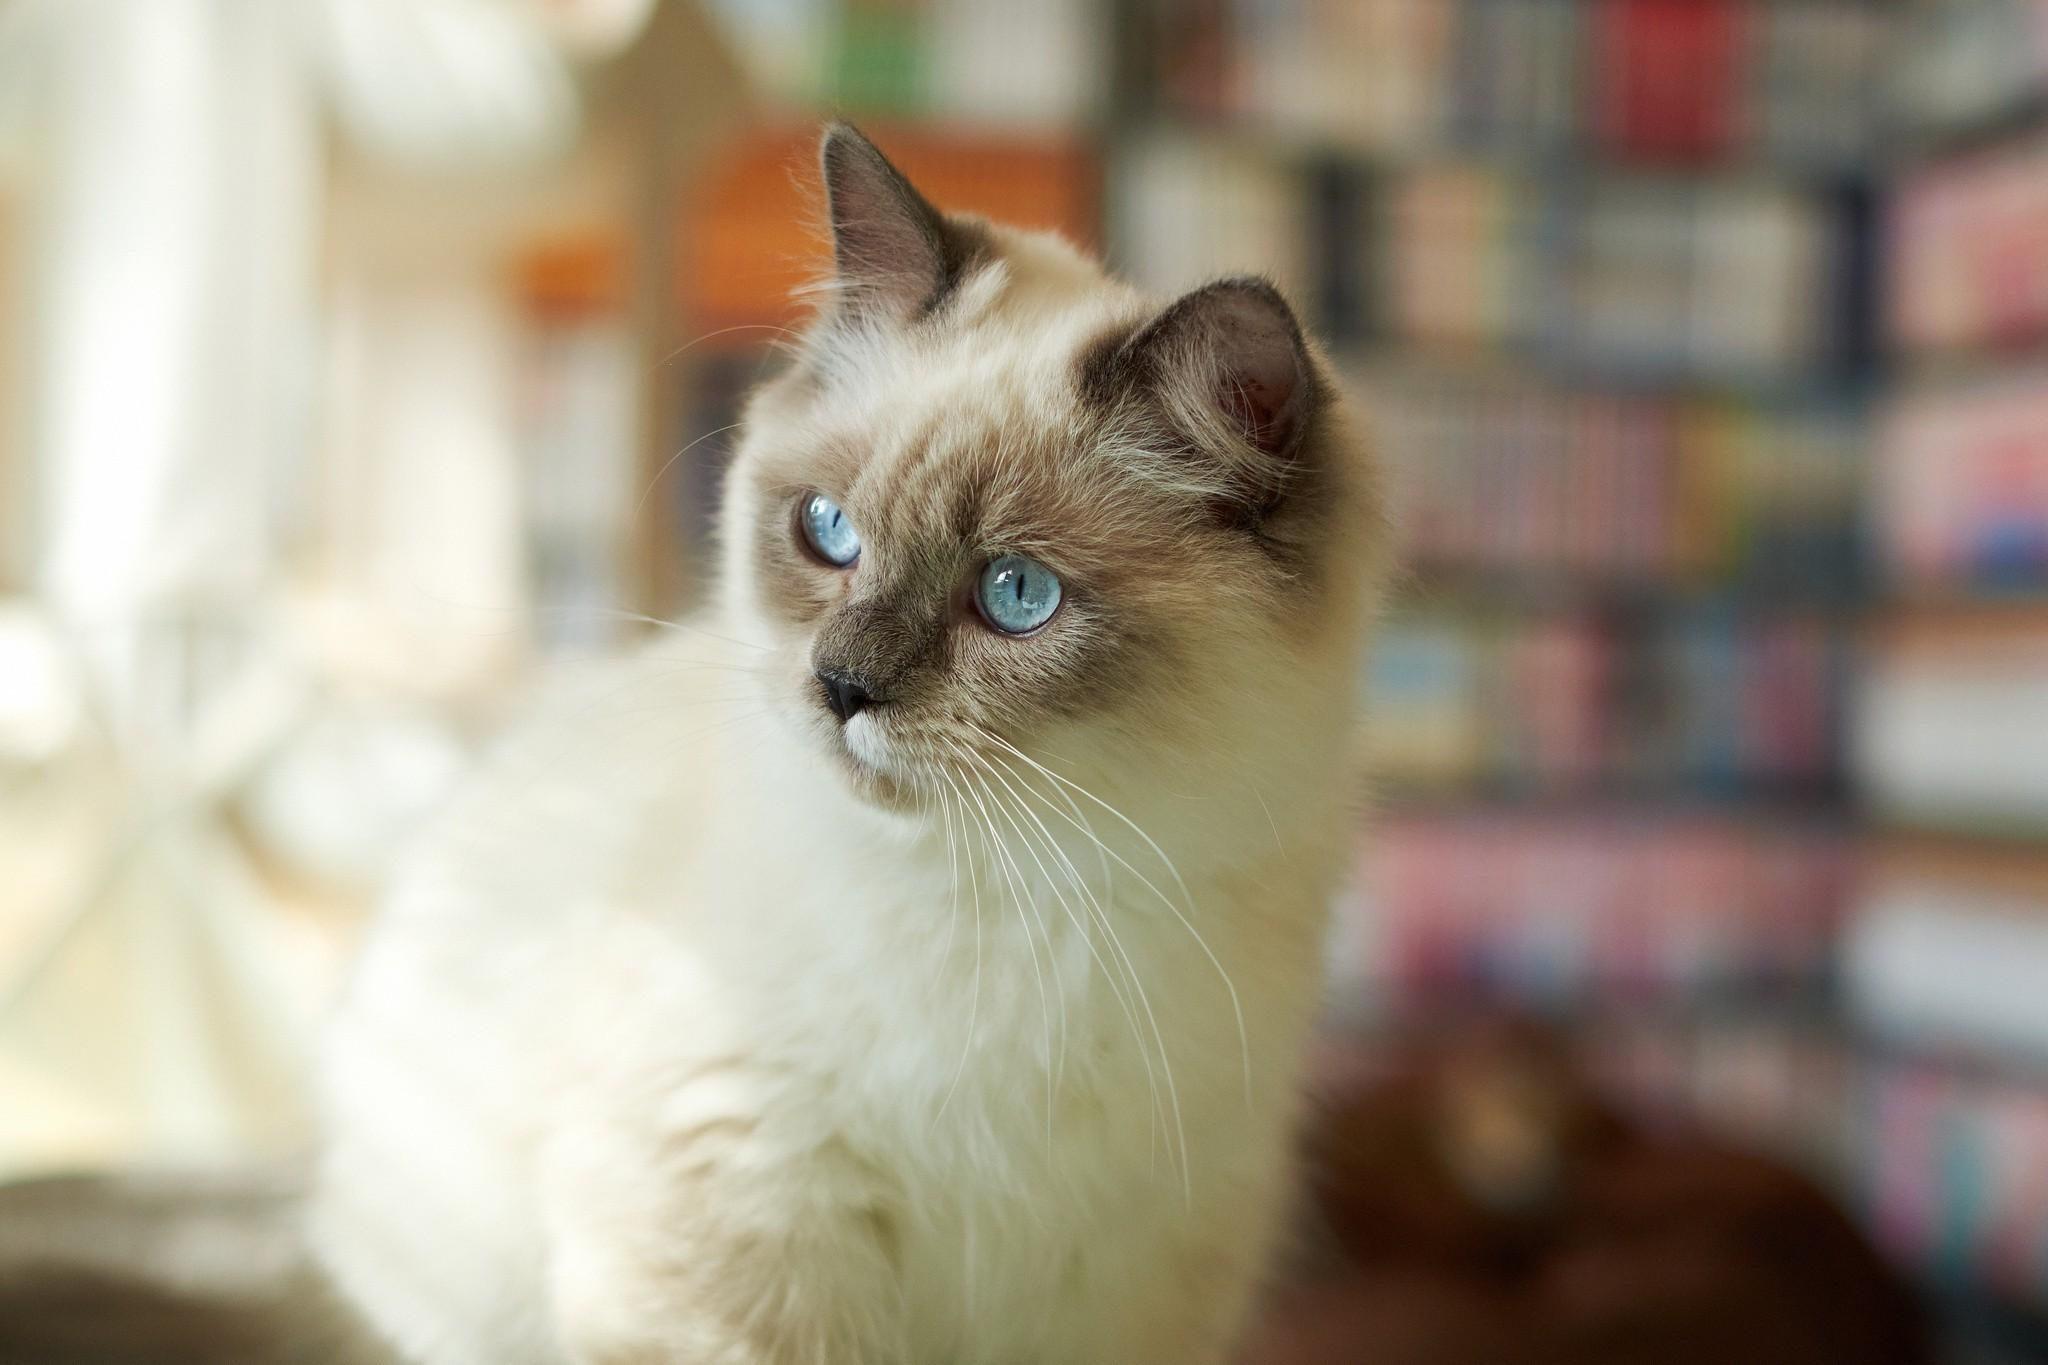 Cute Kitten Wallpaper For Mobile Siamese Cat Wallpaper 183 ①